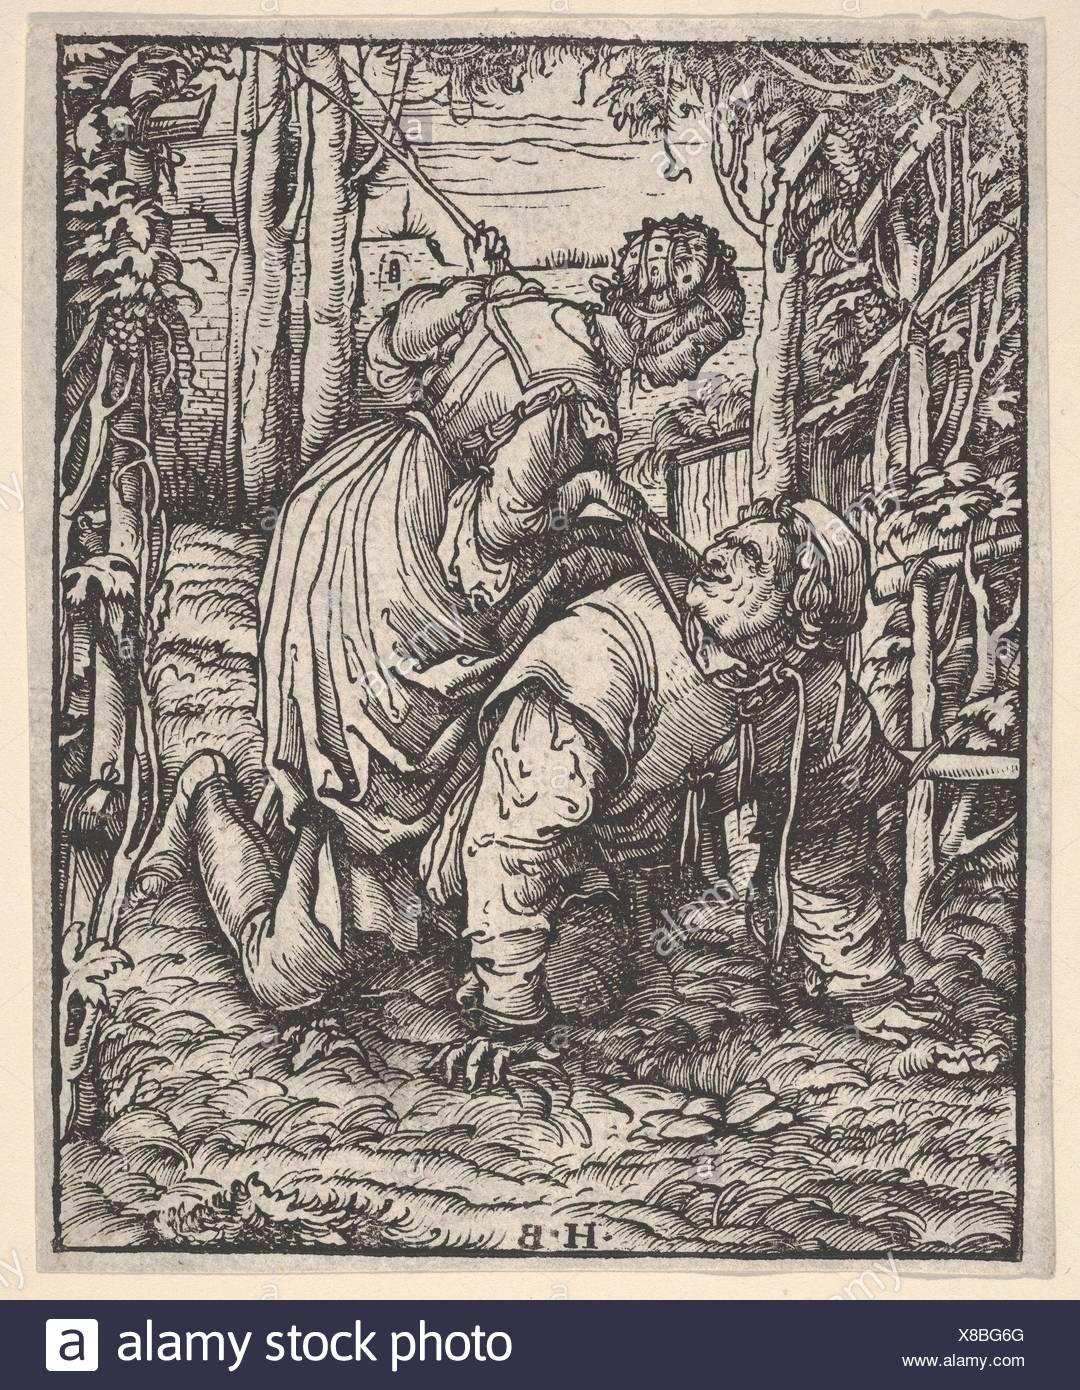 Künstler Augsburg aristoteles und phyllis künstler hans burgkmair augsburg